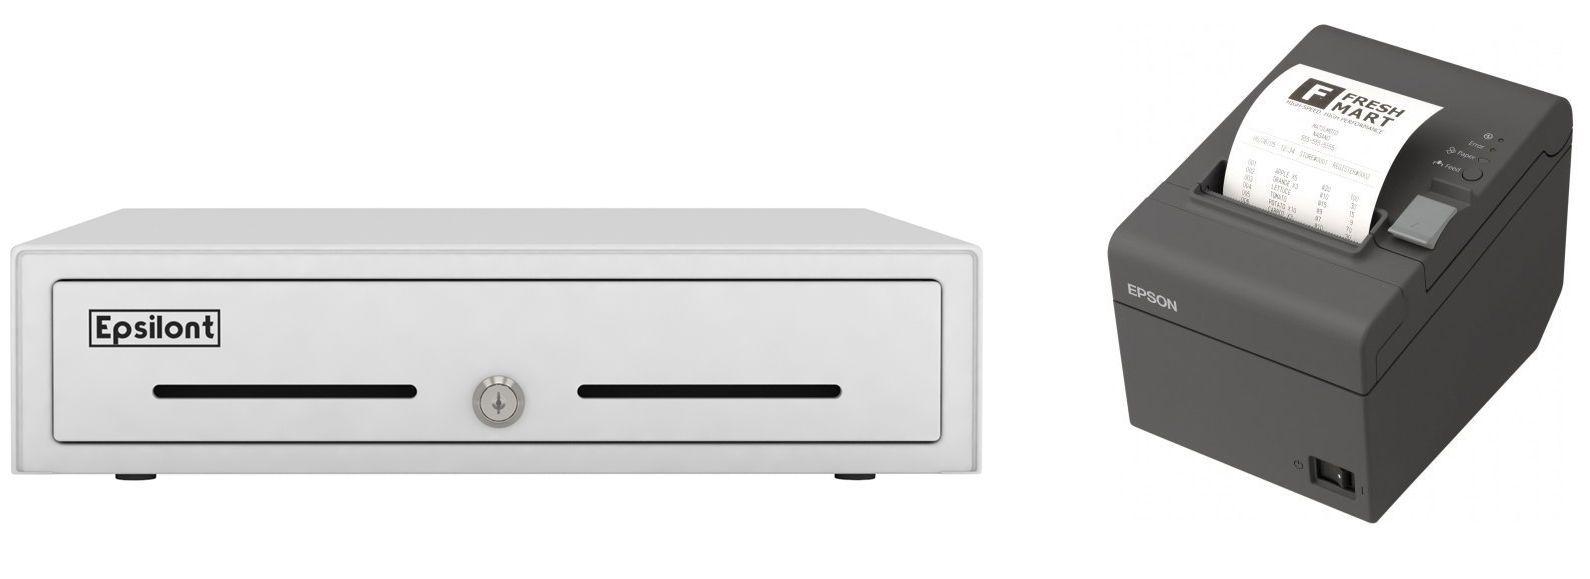 hardware cash products pos drawer gallery en shop square us cashdrawer kit retail wifi apparel register drawers usbprinter